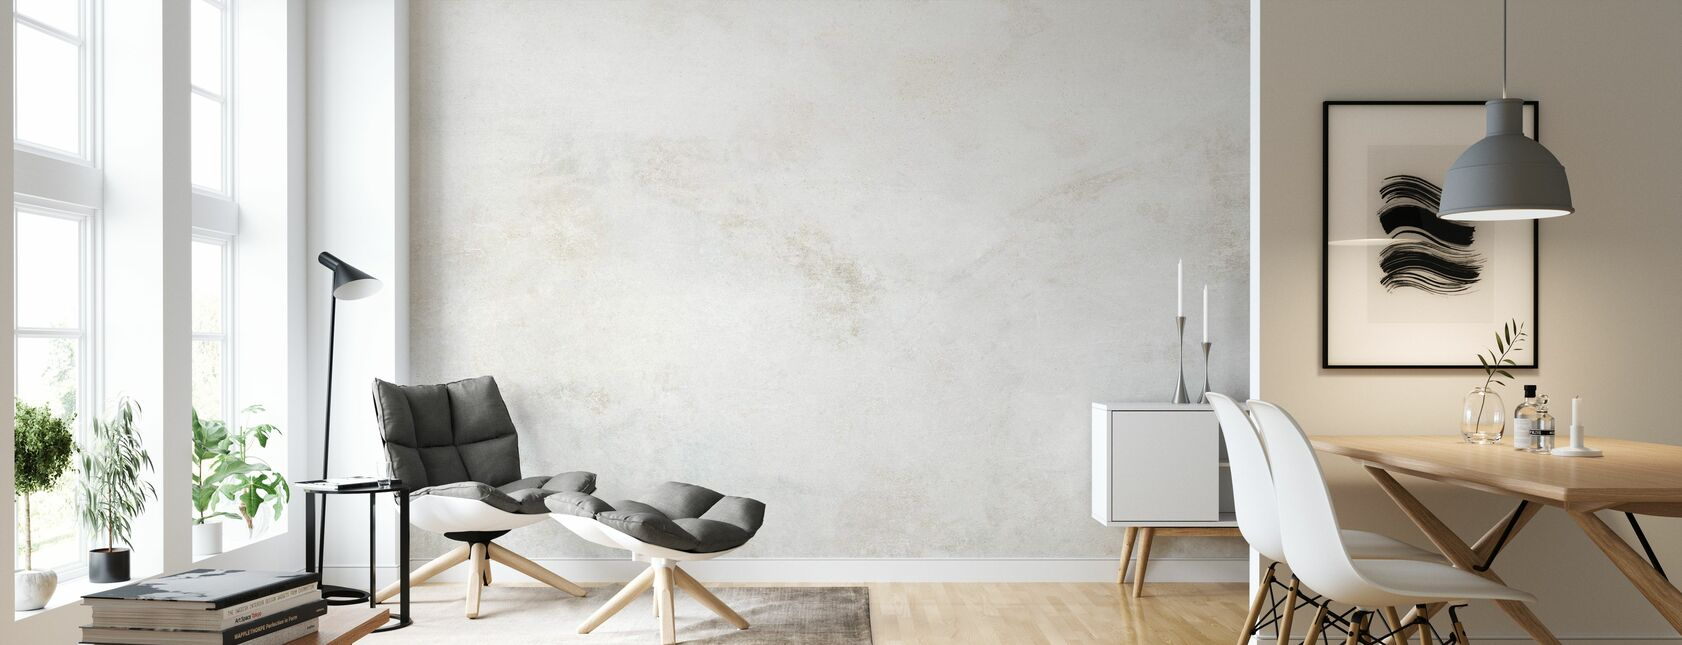 Grunge Wall - Wallpaper - Living Room